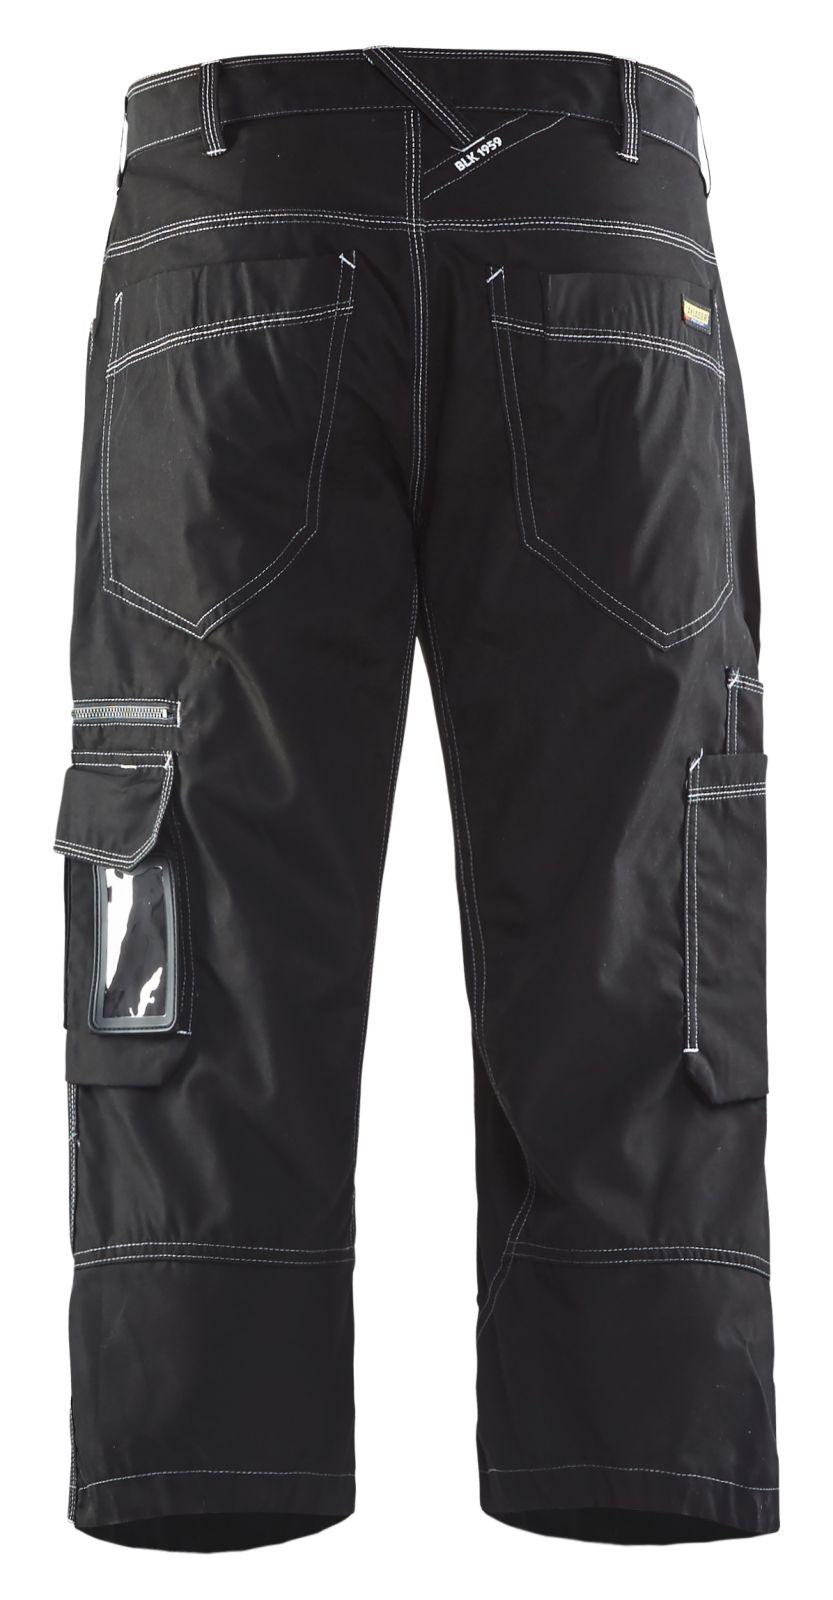 Blaklader Piraatbroeken 19581845 zwart(9900)